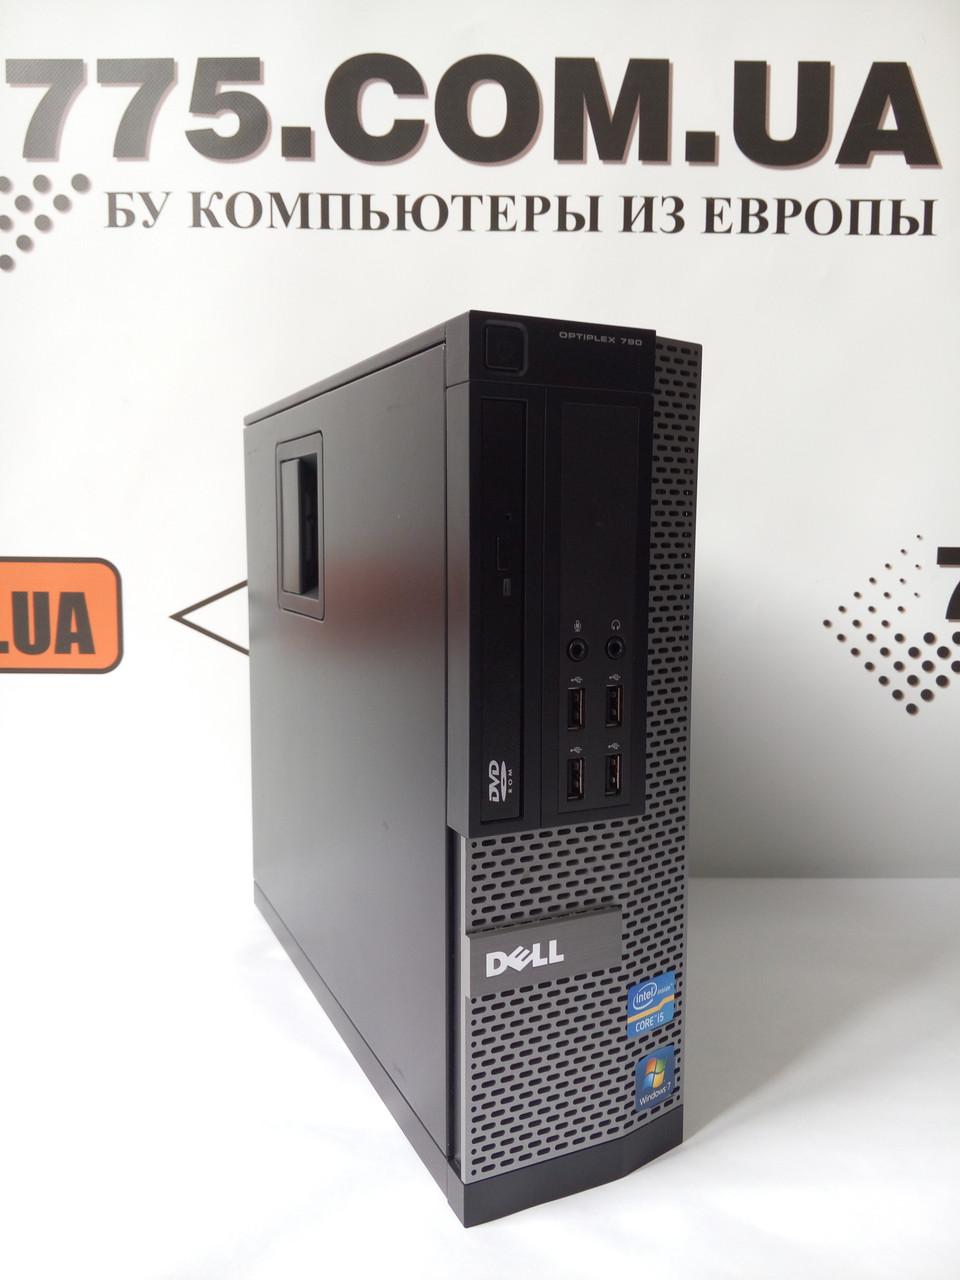 Компьютер Dell 790 (SFF), Intel Core i3-2100 3.1GHz, RAM 4ГБ, HDD 250ГБ